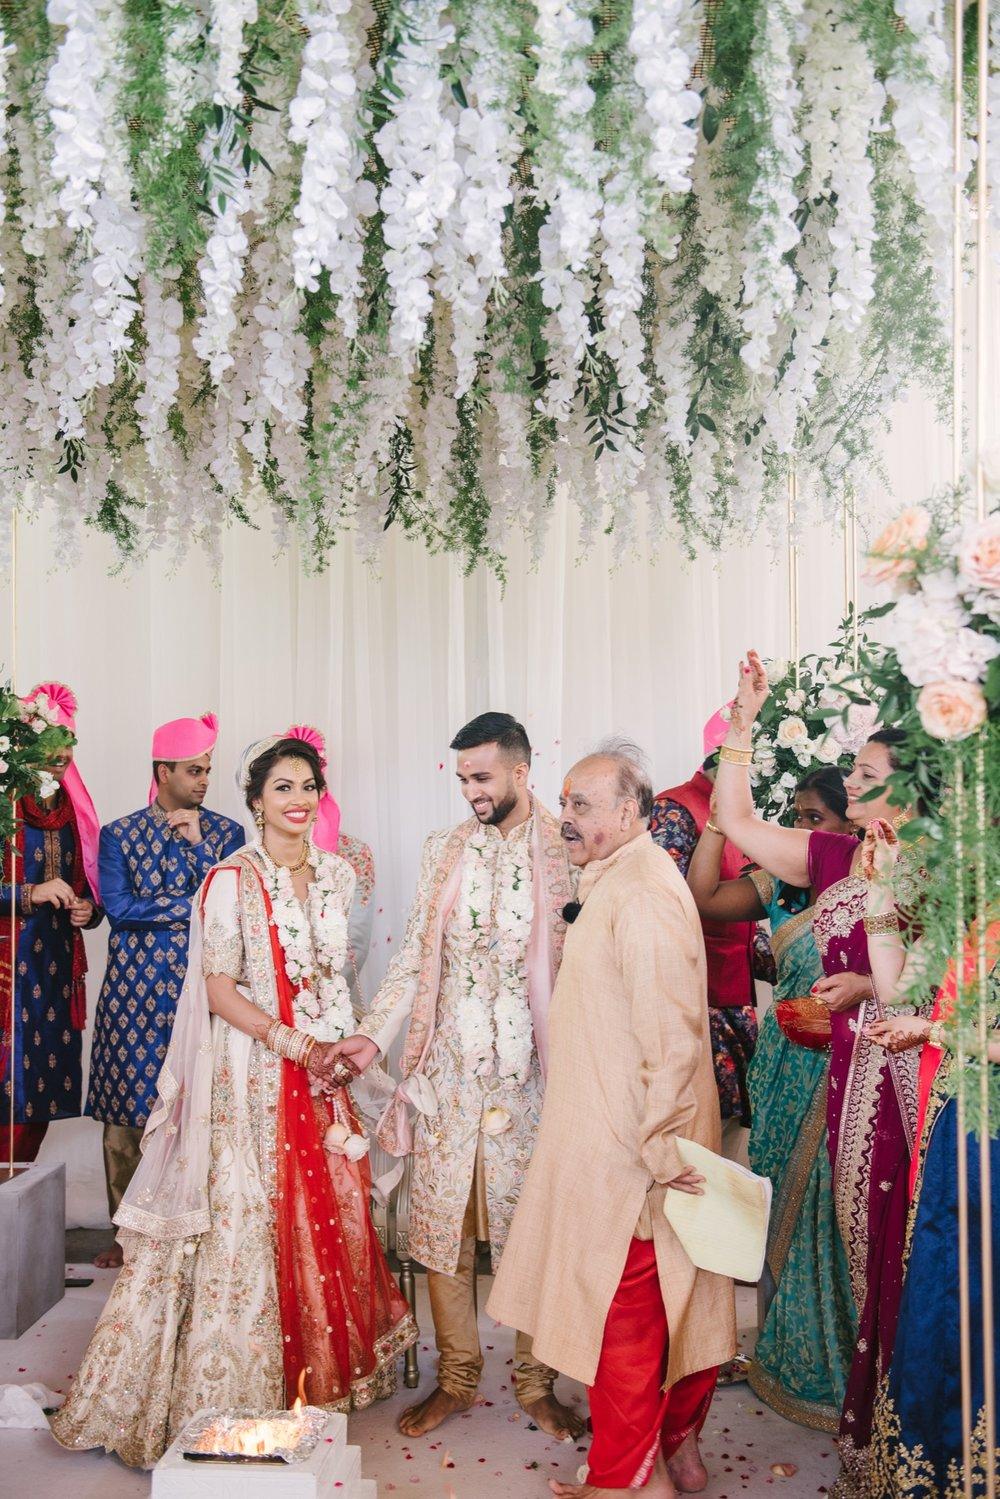 kanksha-and-rakesh-guild-inn-outdoor-hindu-wedding-137.jpg